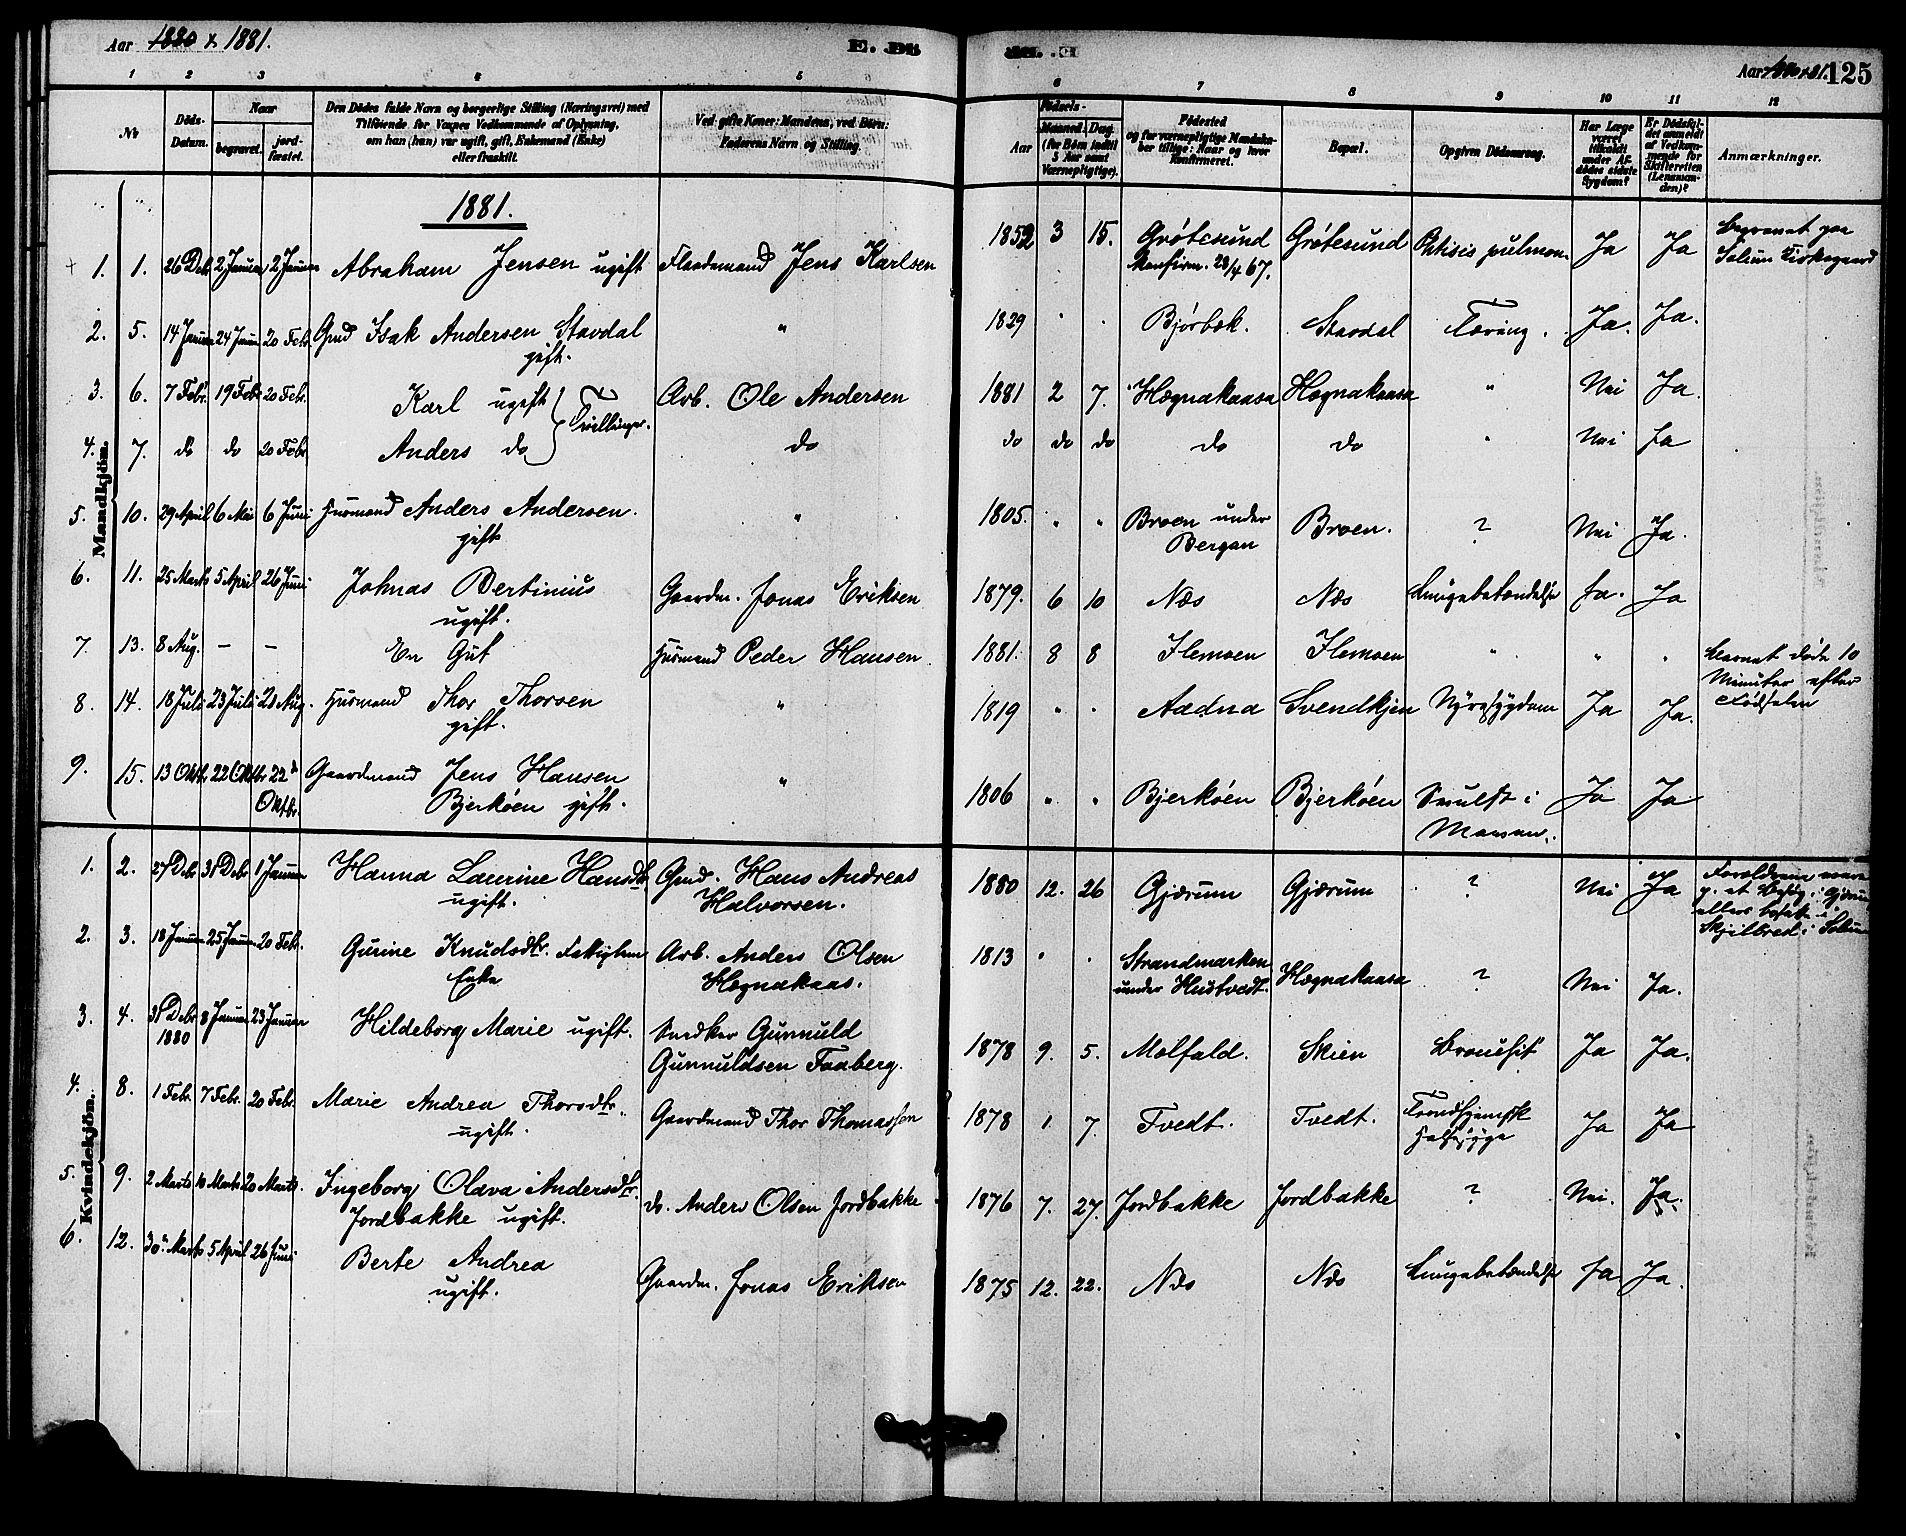 SAKO, Solum kirkebøker, F/Fb/L0001: Ministerialbok nr. II 1, 1877-1892, s. 125